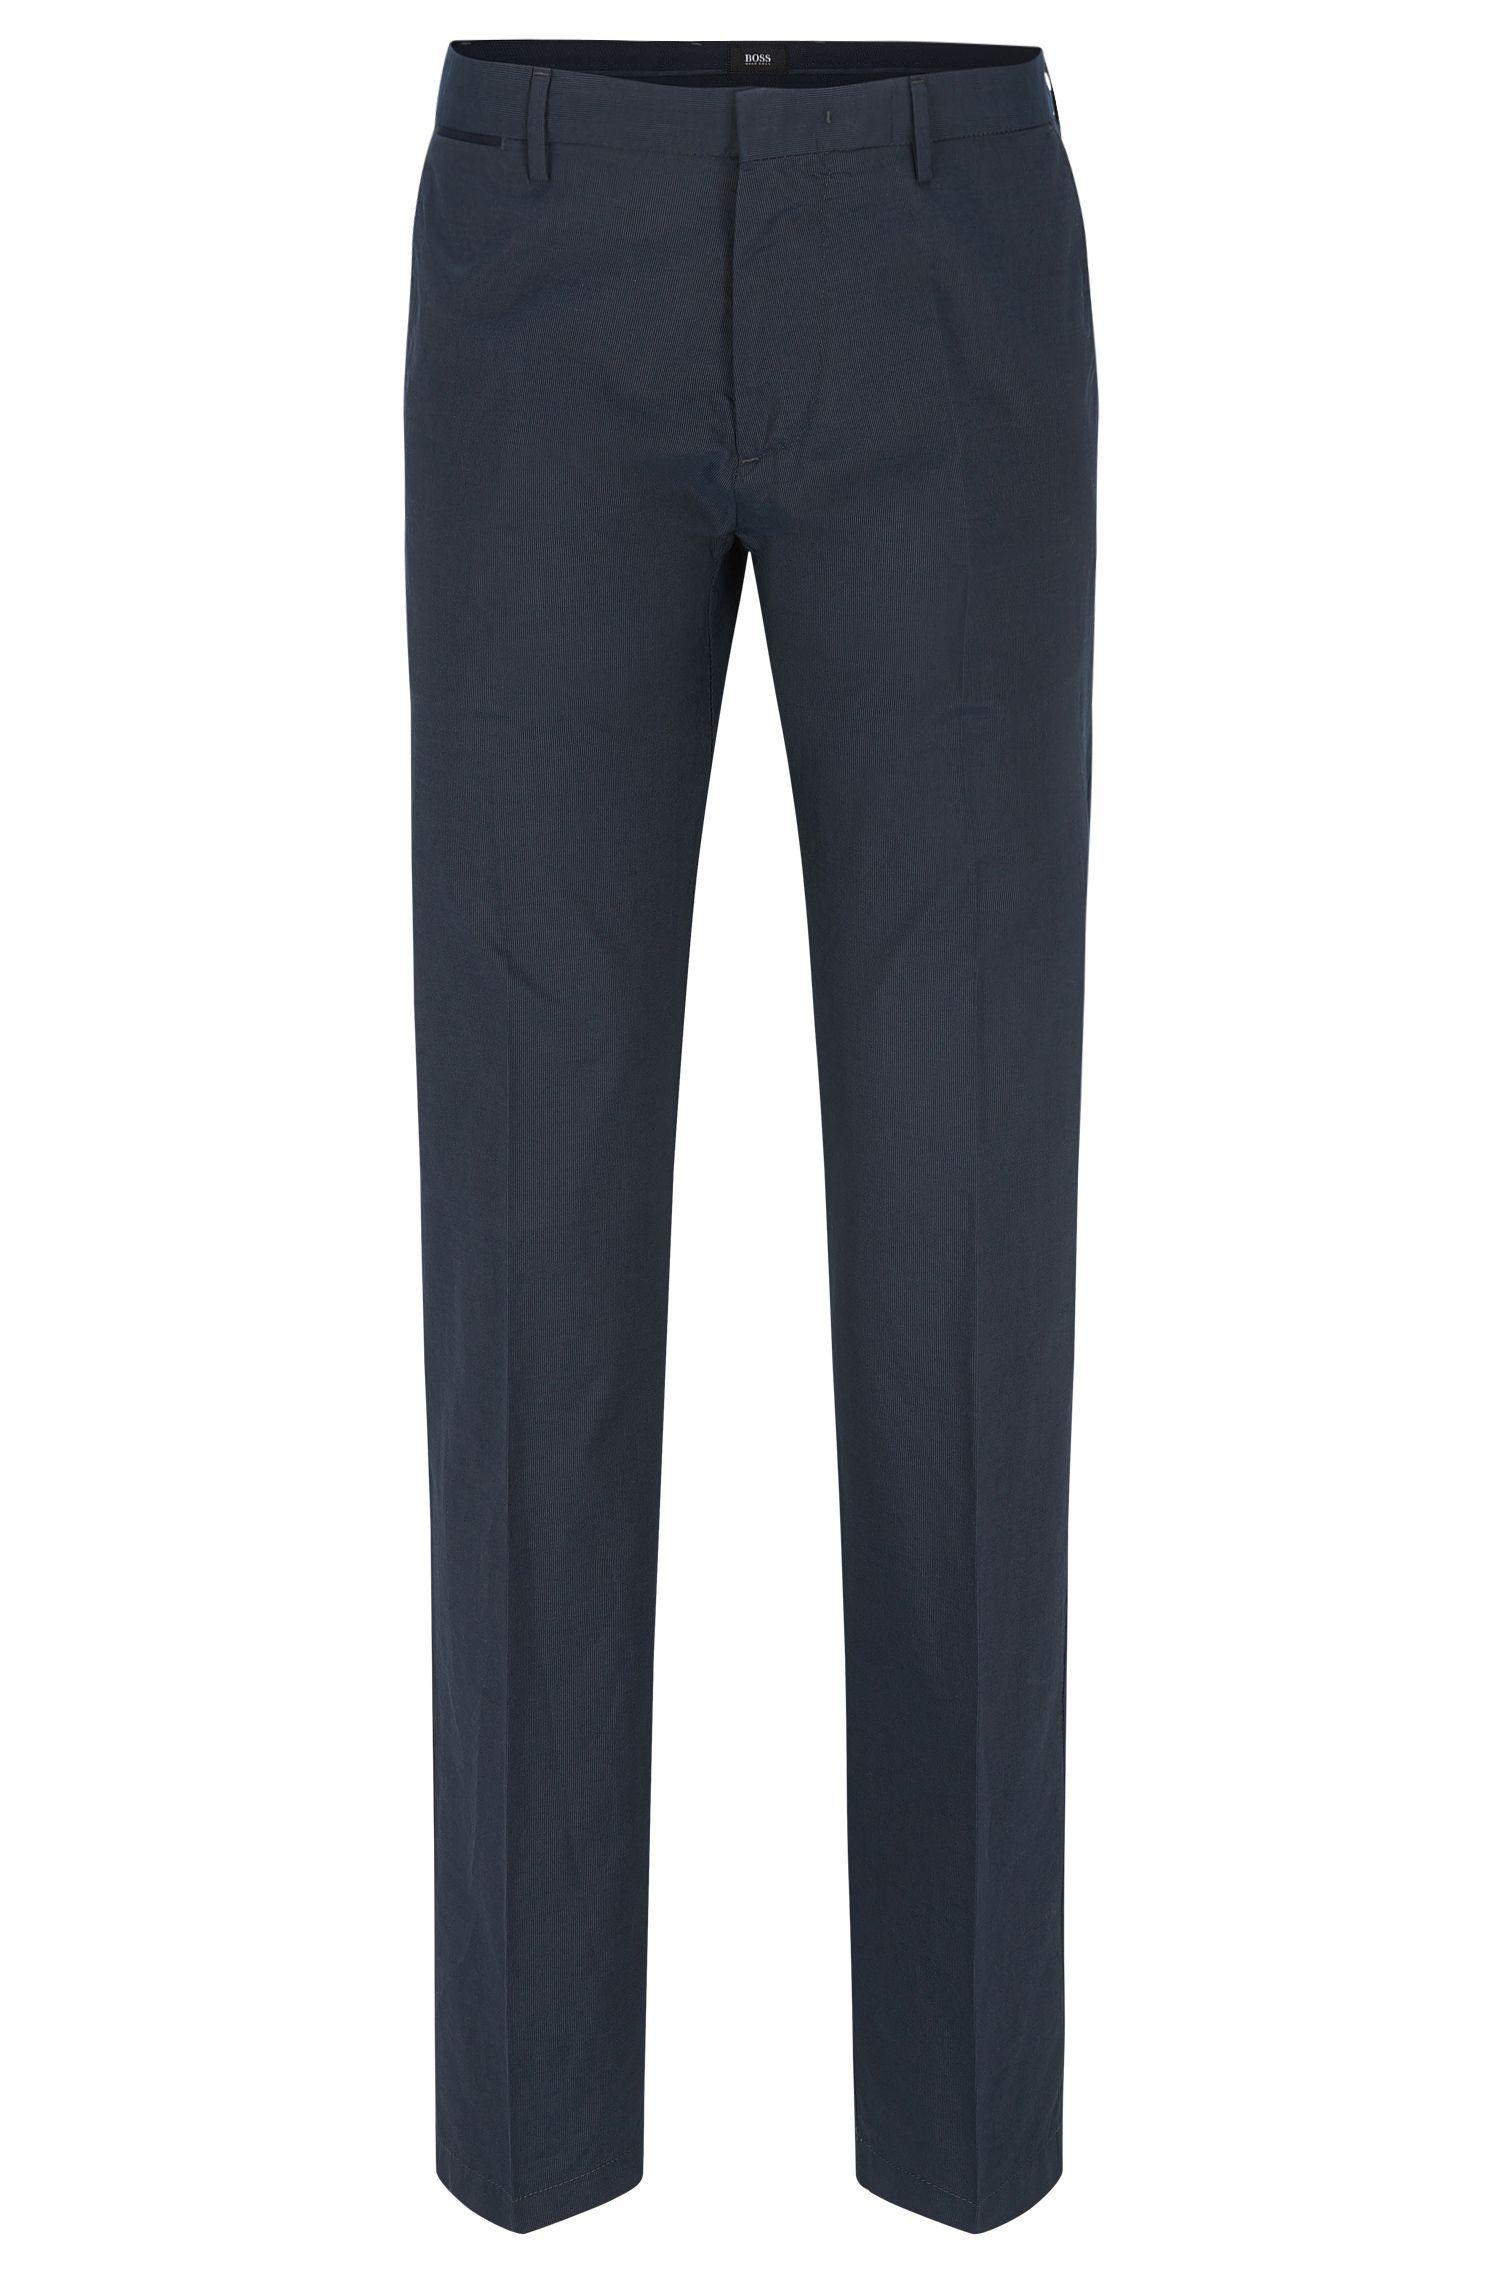 Cotton-Silk Pant, Regular Fit | Crigan Luxe W